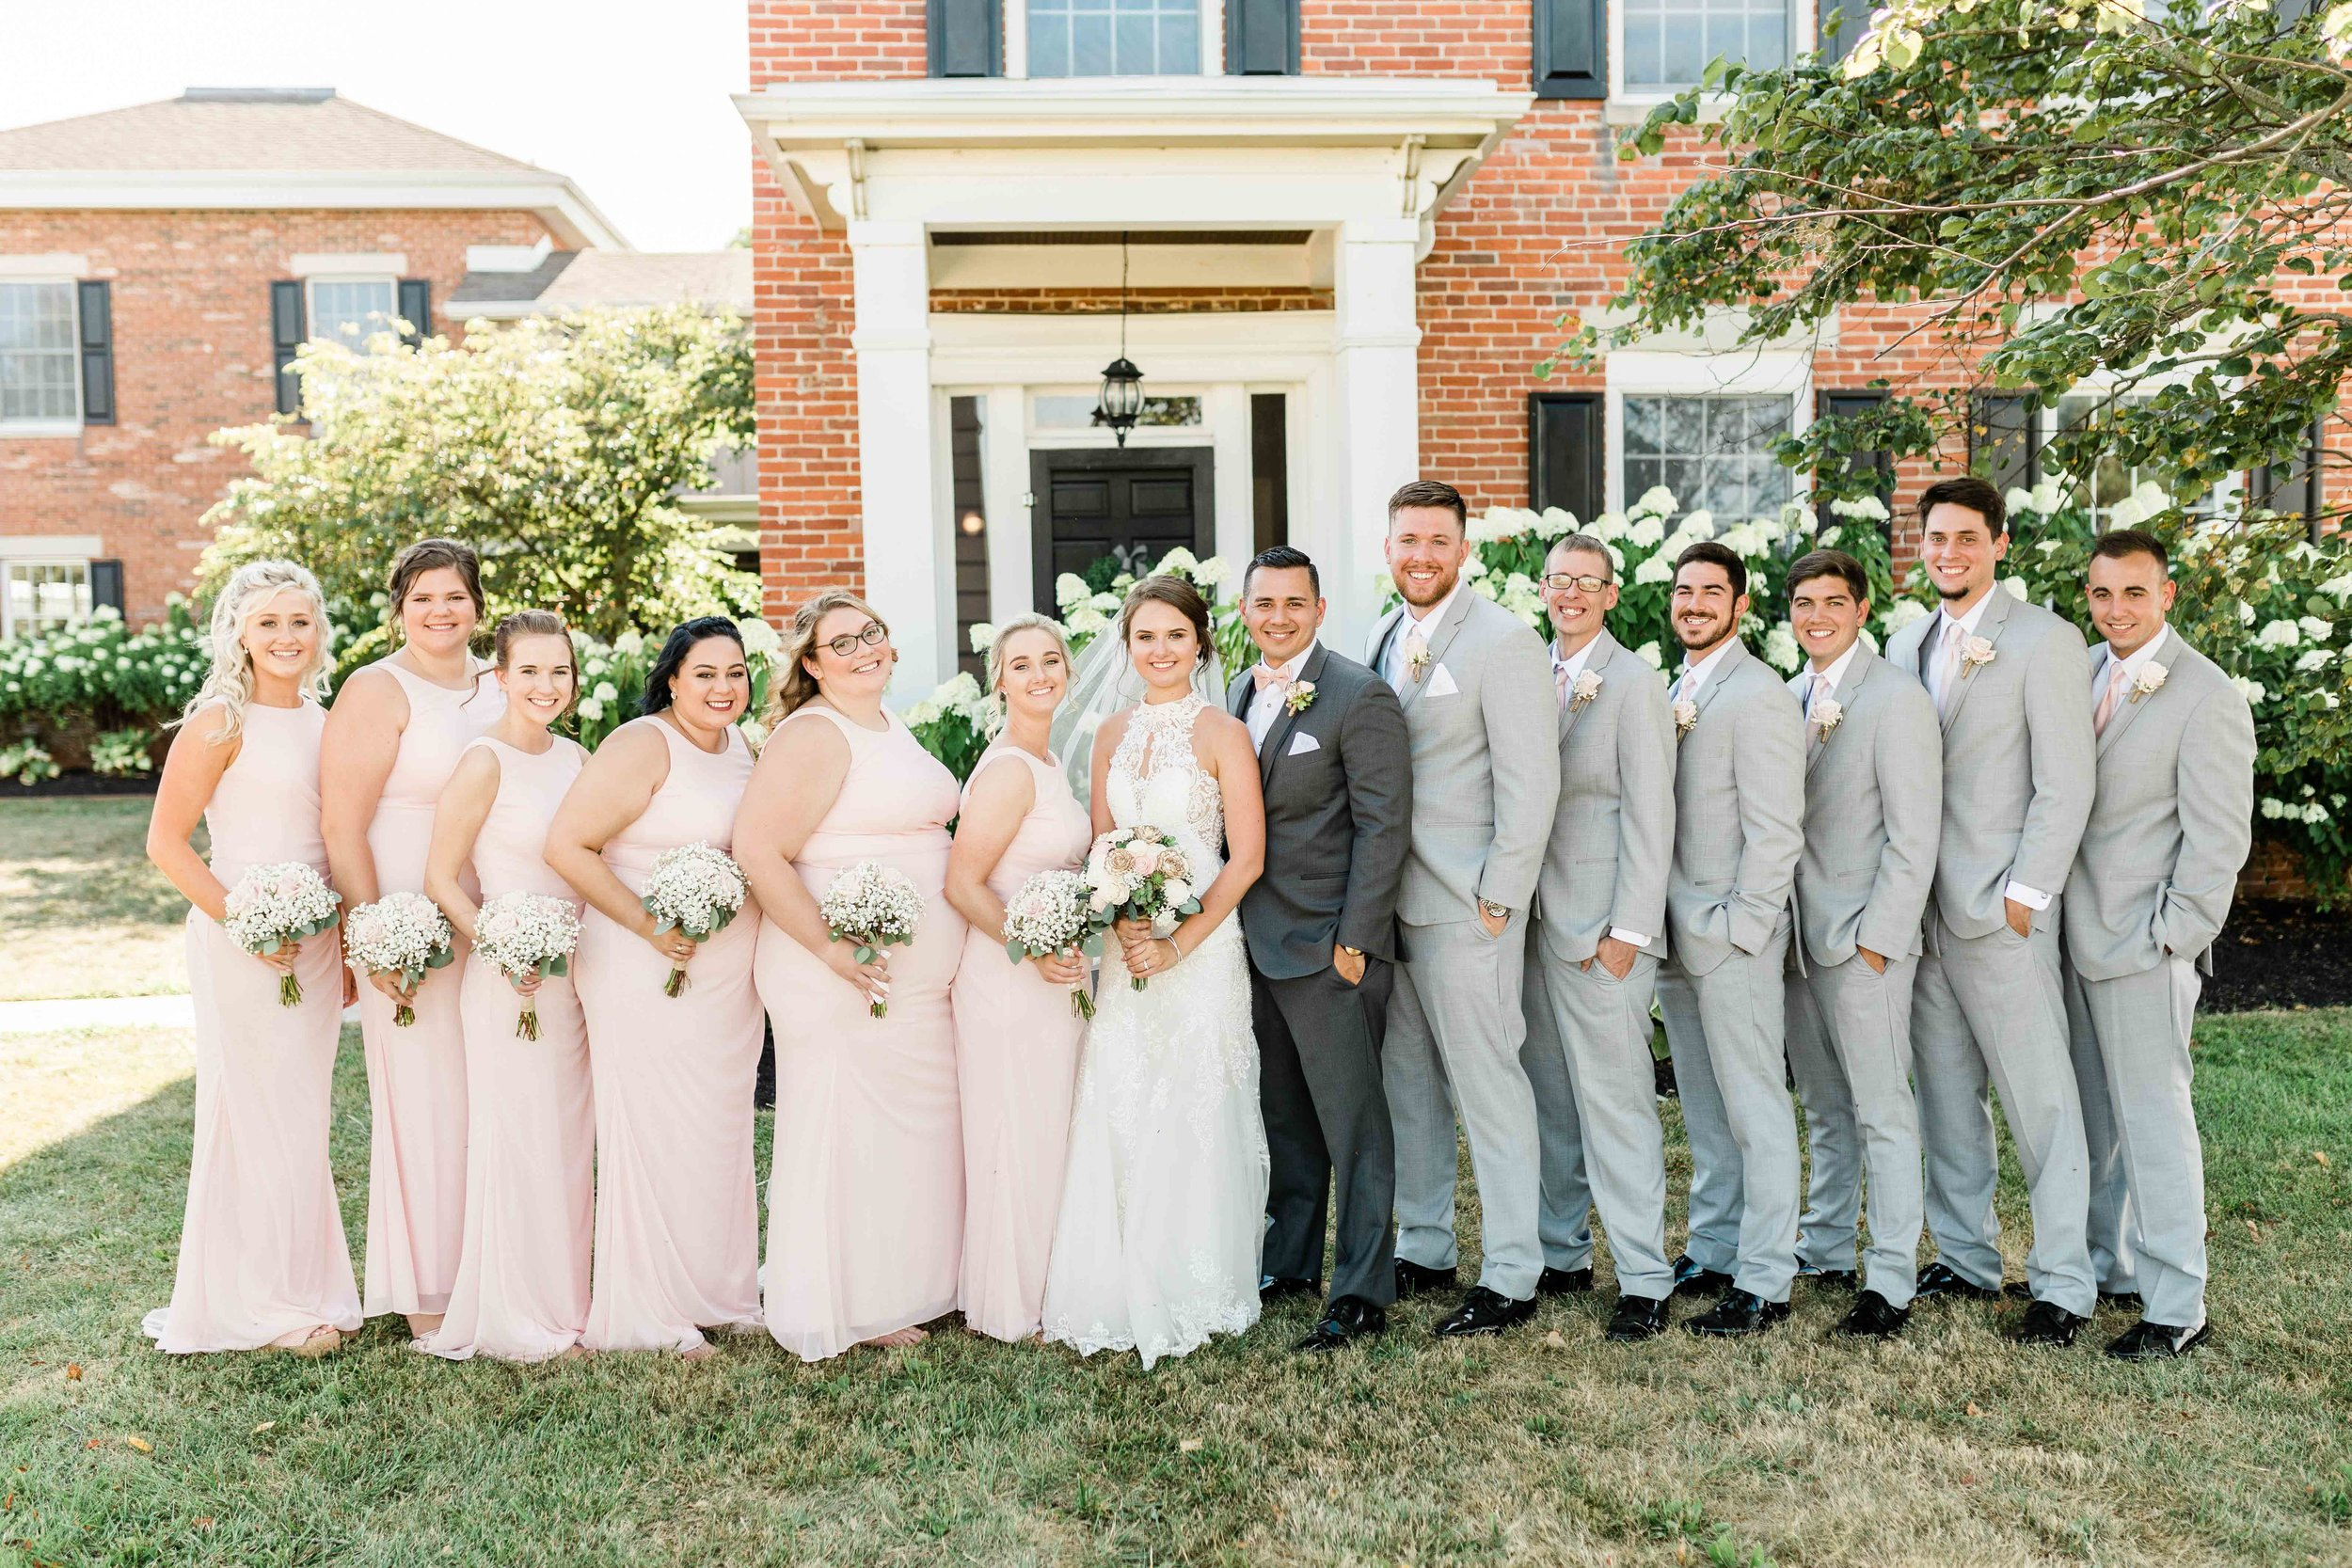 wren farm ohio wedding photography-1.jpg